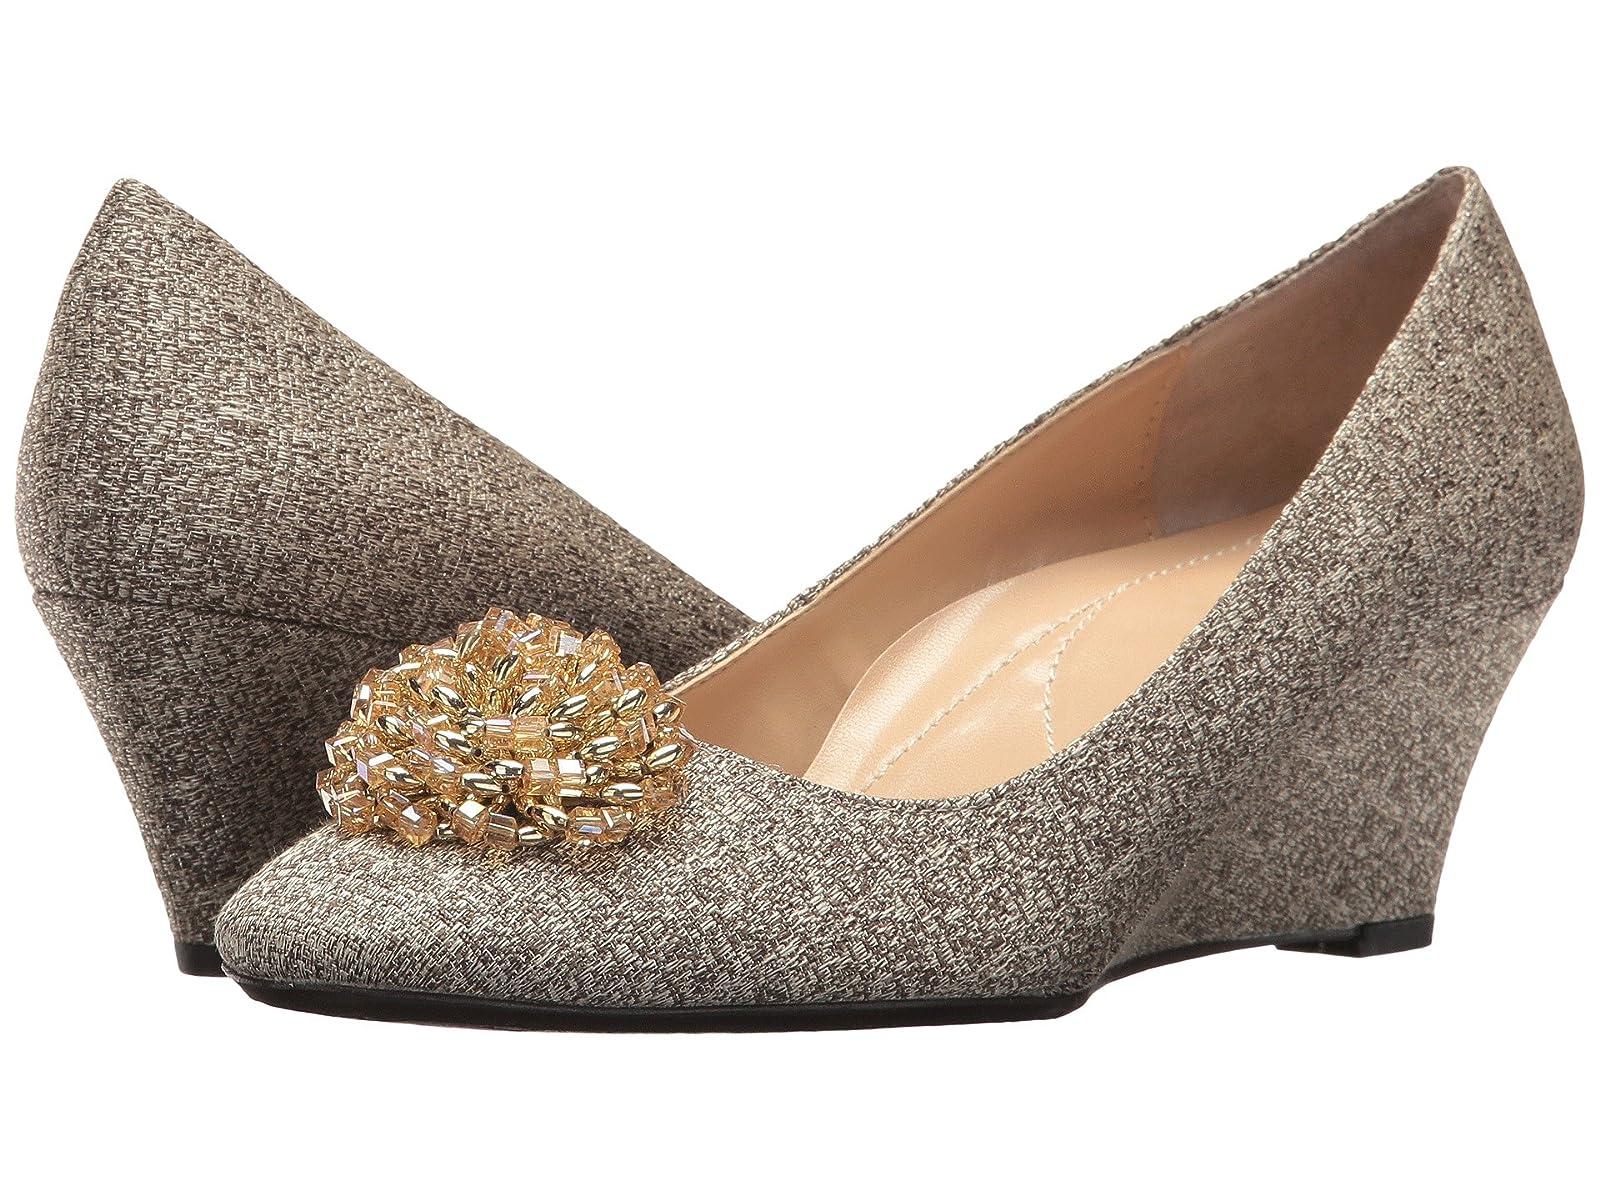 J. Renee EloisaCheap and distinctive eye-catching shoes